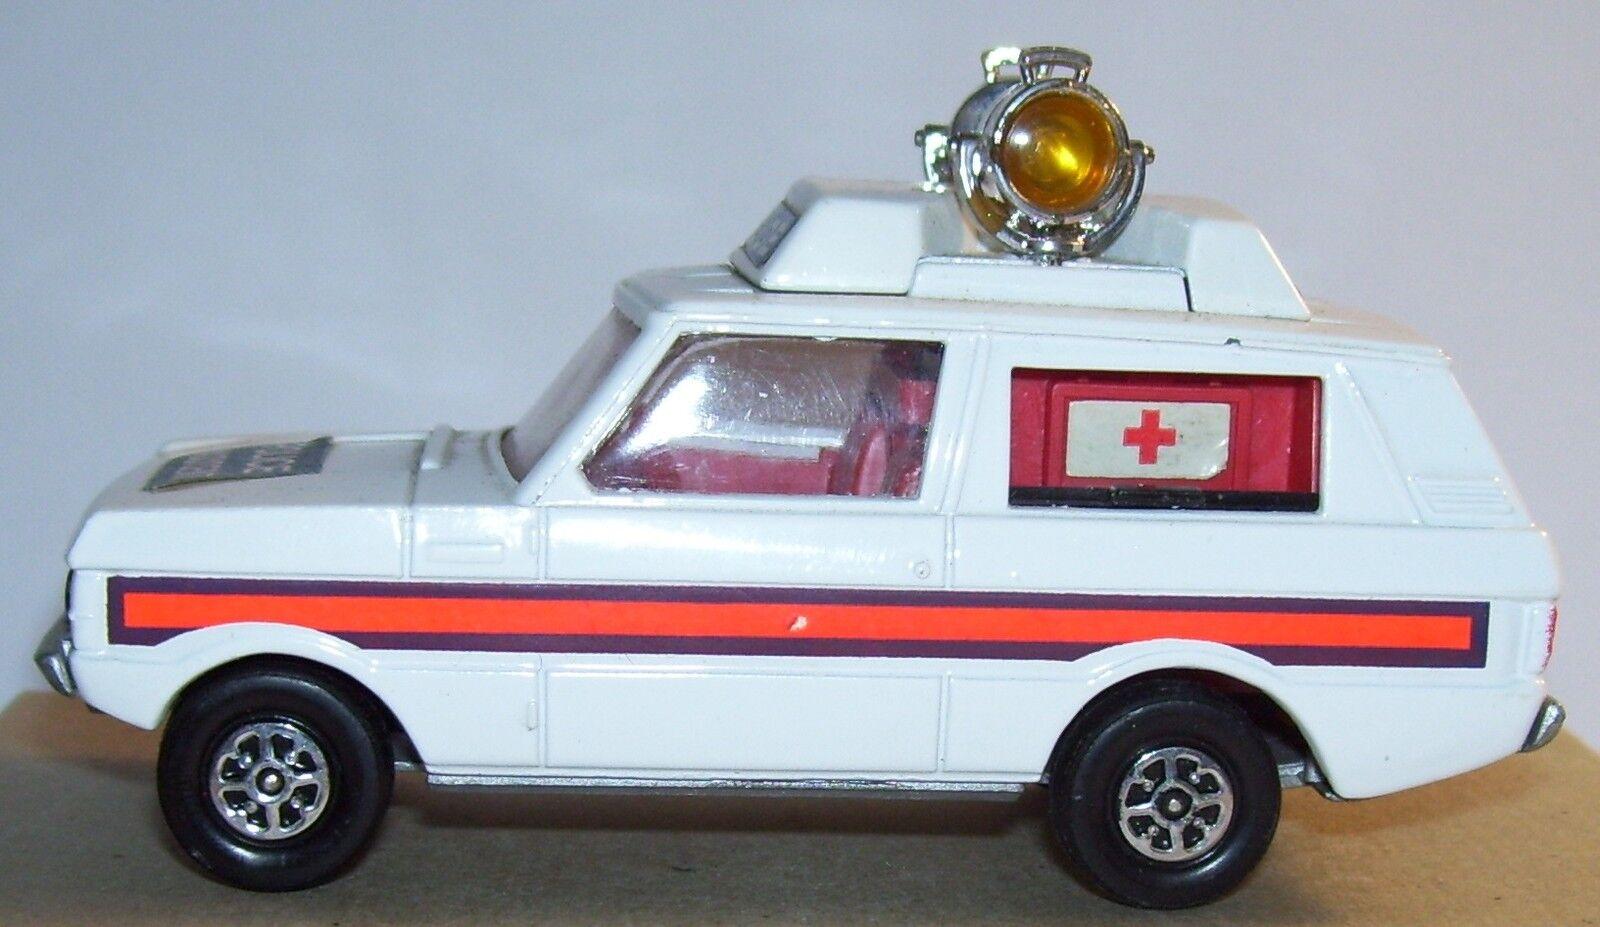 RARE CORGI TOYS RANGE ROVER POLICE VIGILANT AMBULANCE CROIX ROUGE 1971 REF 461-1